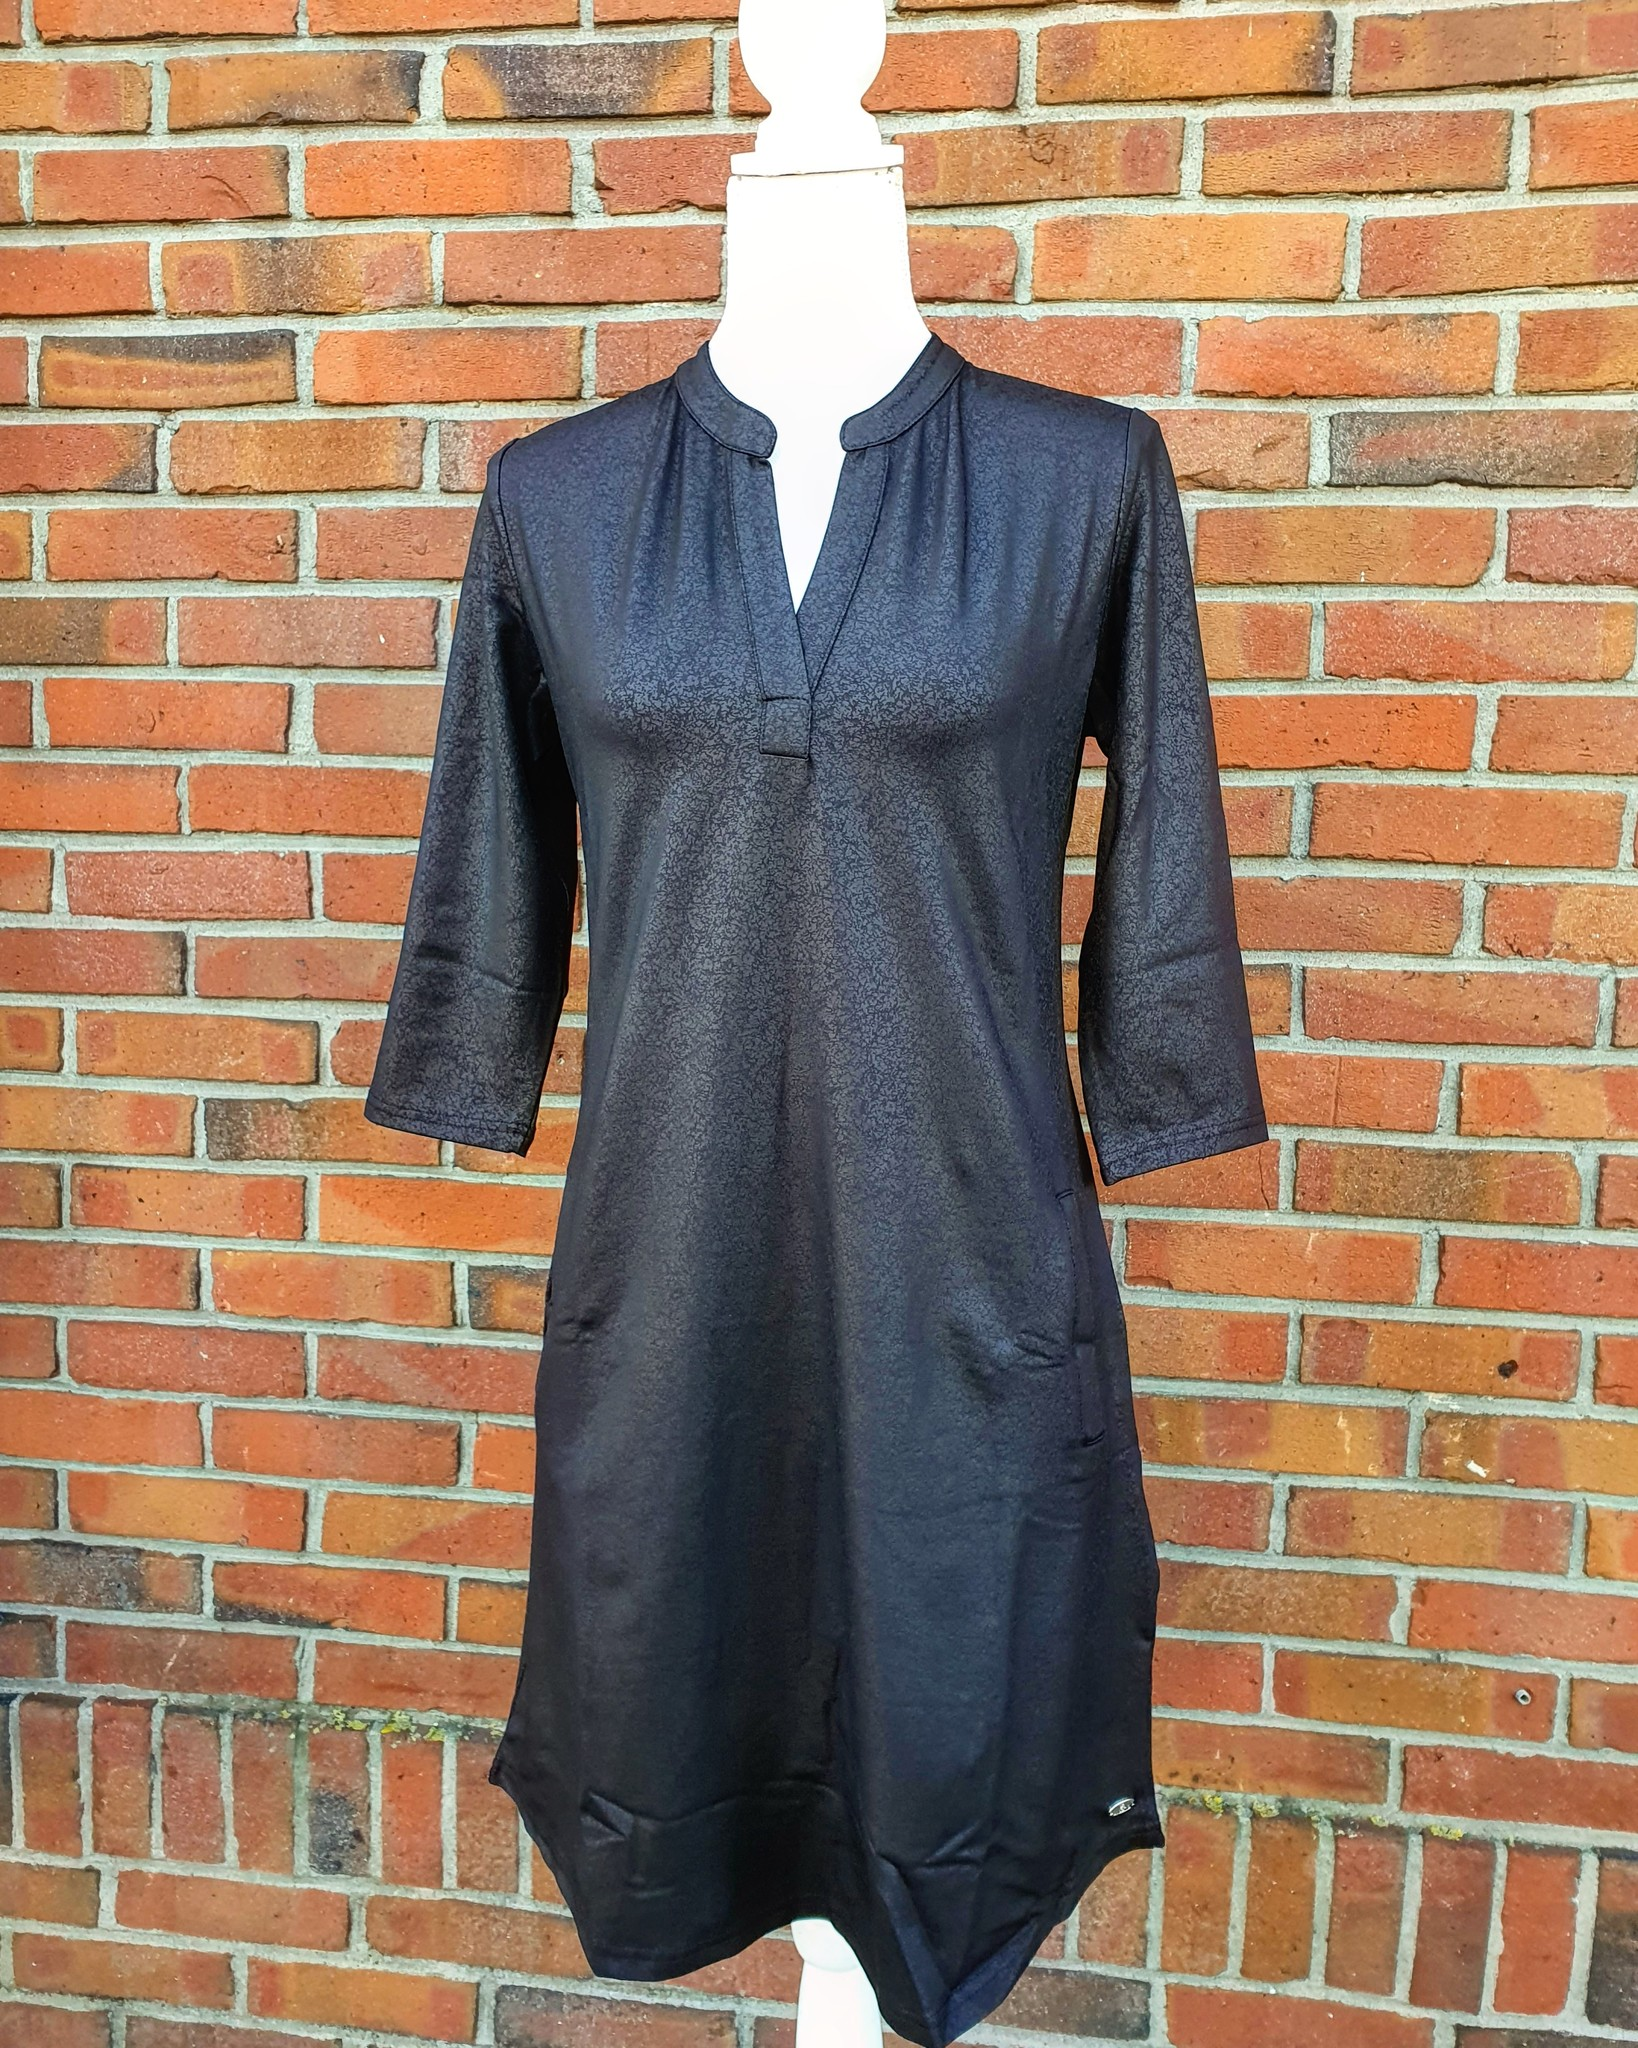 Angelle Milan Angelle Milan jurk leatherlook zwart 1467